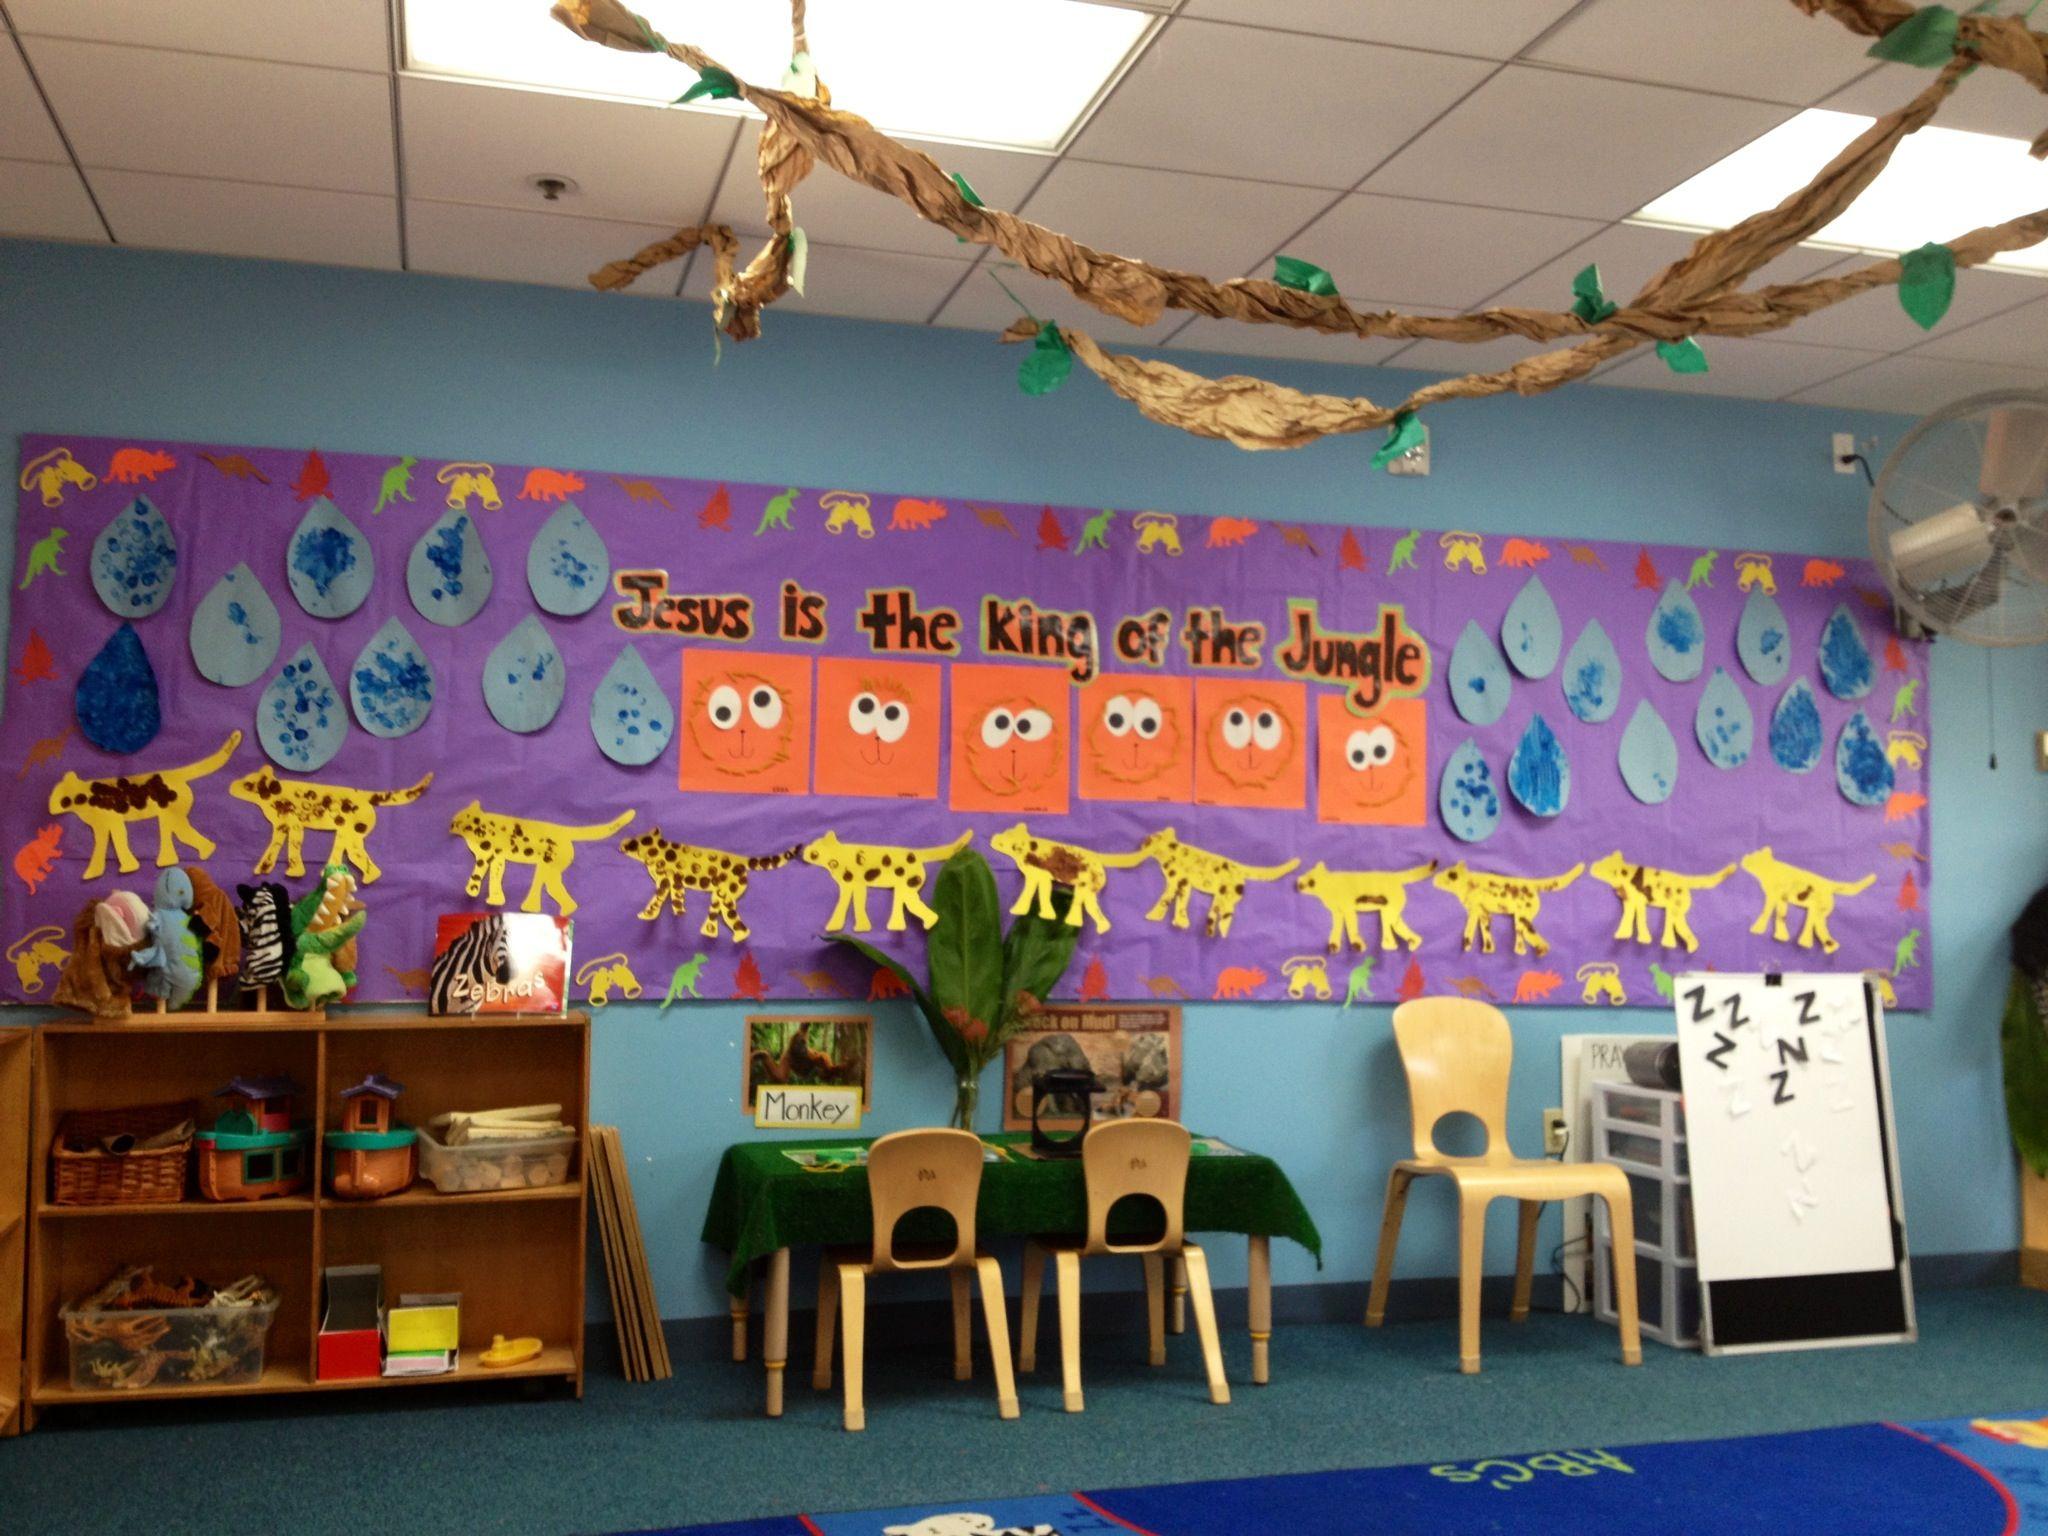 Preschool Jungle Theme Cork Painting Cheetahs Spiral Pasta Lions Cork Painted Rain Drops Noah S